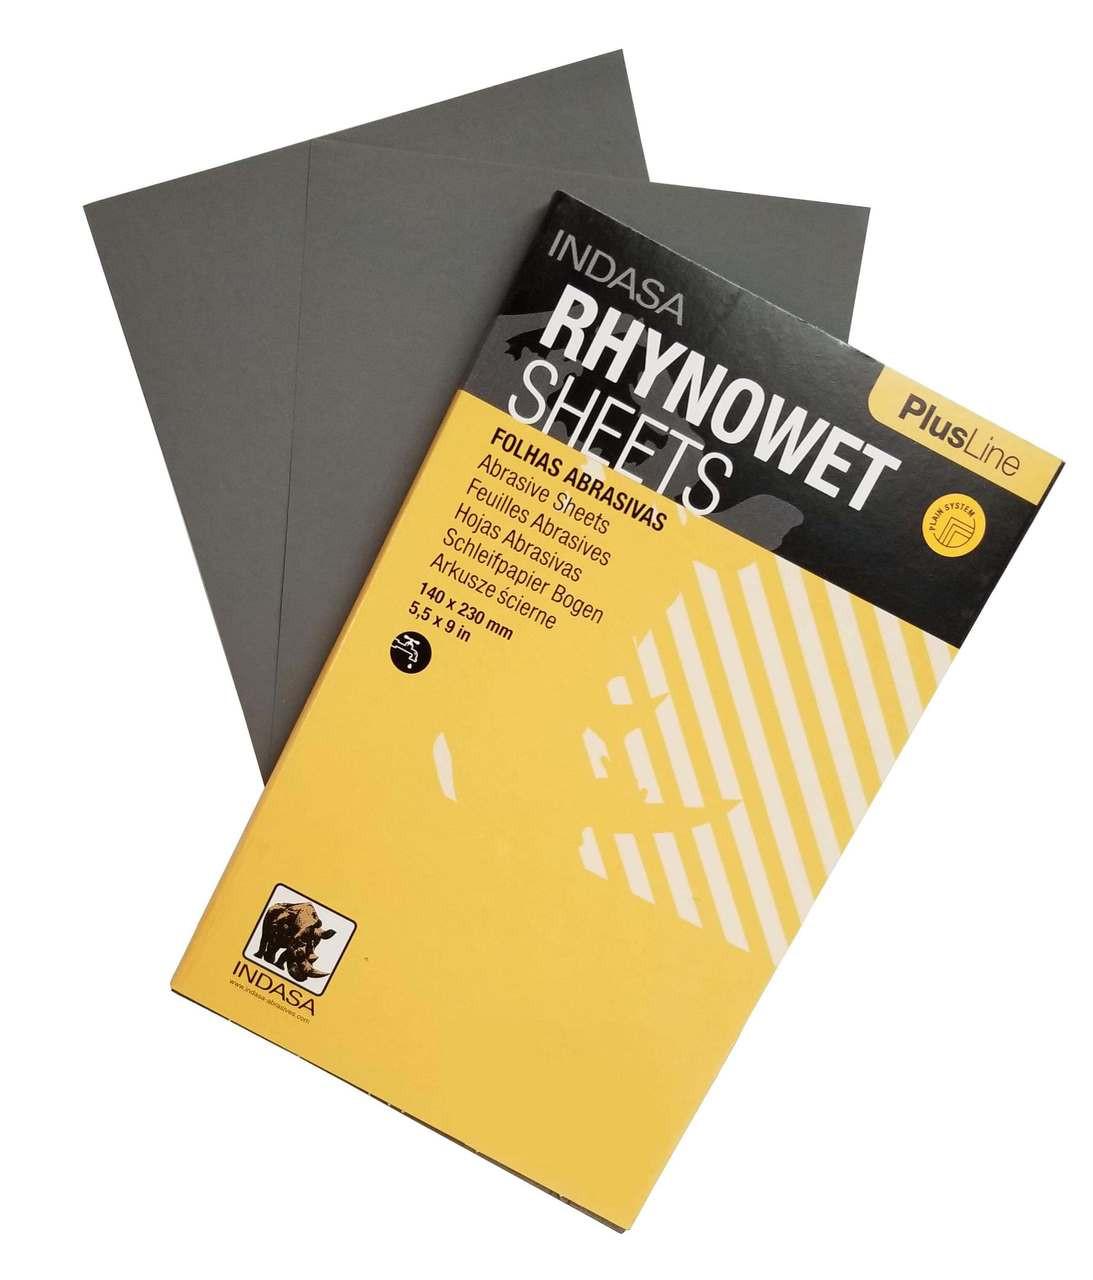 Indasa RhynoWet PlusLine Sandpaper Wet/Dry Half Sheet